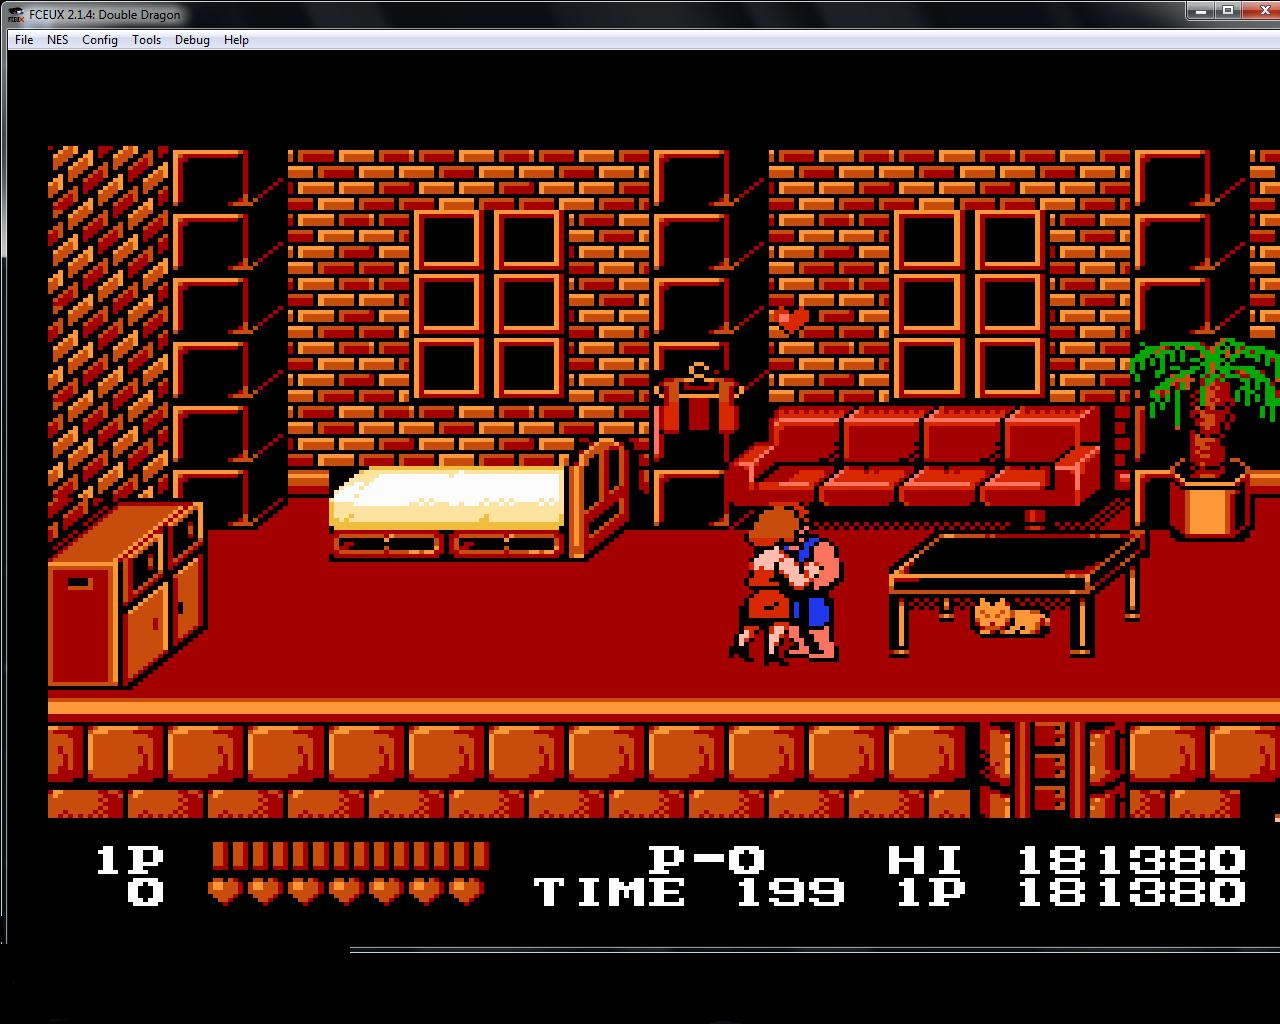 bubufubu: Double Dragon (NES/Famicom Emulated) 181,380 points on 2015-01-15 13:01:55